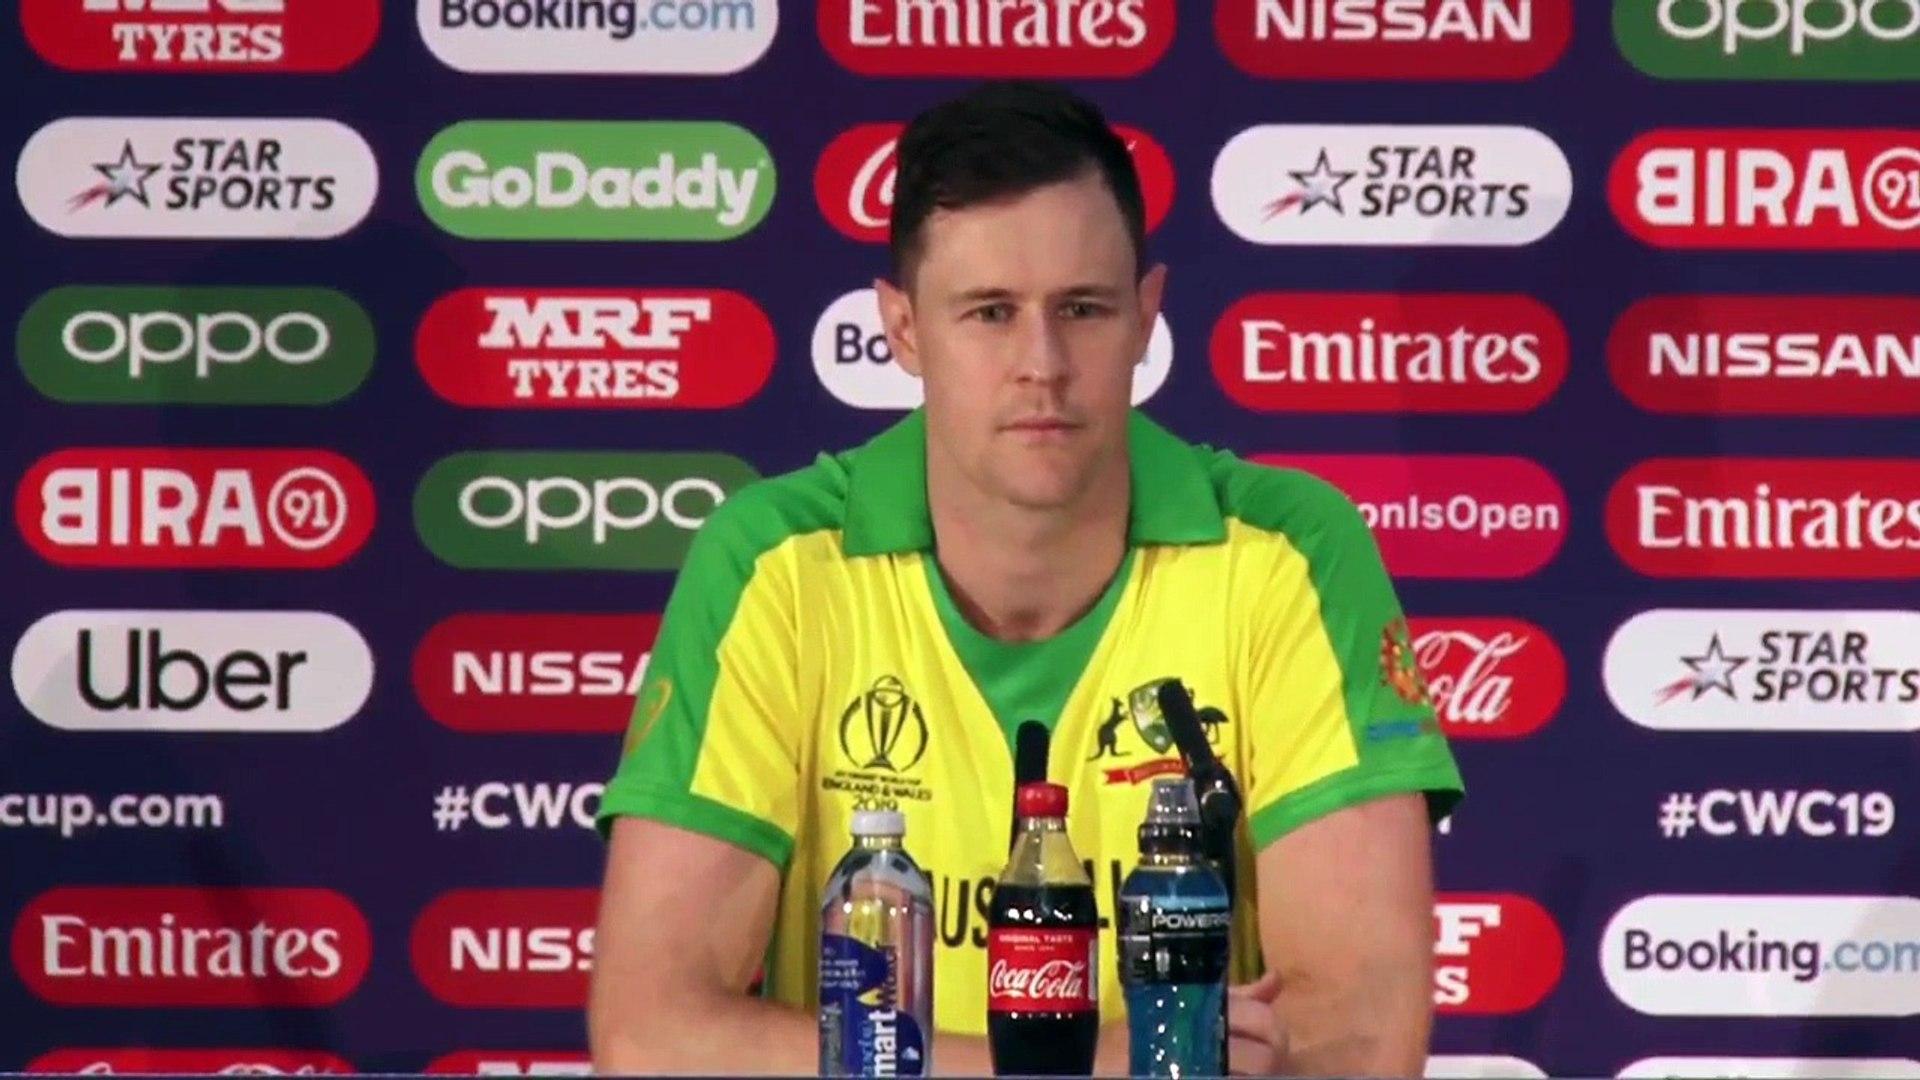 England has vulnerable batting unit - Jason Behrendorff | AUS | ENG VS AUS | ICC Cricket World Cup 2